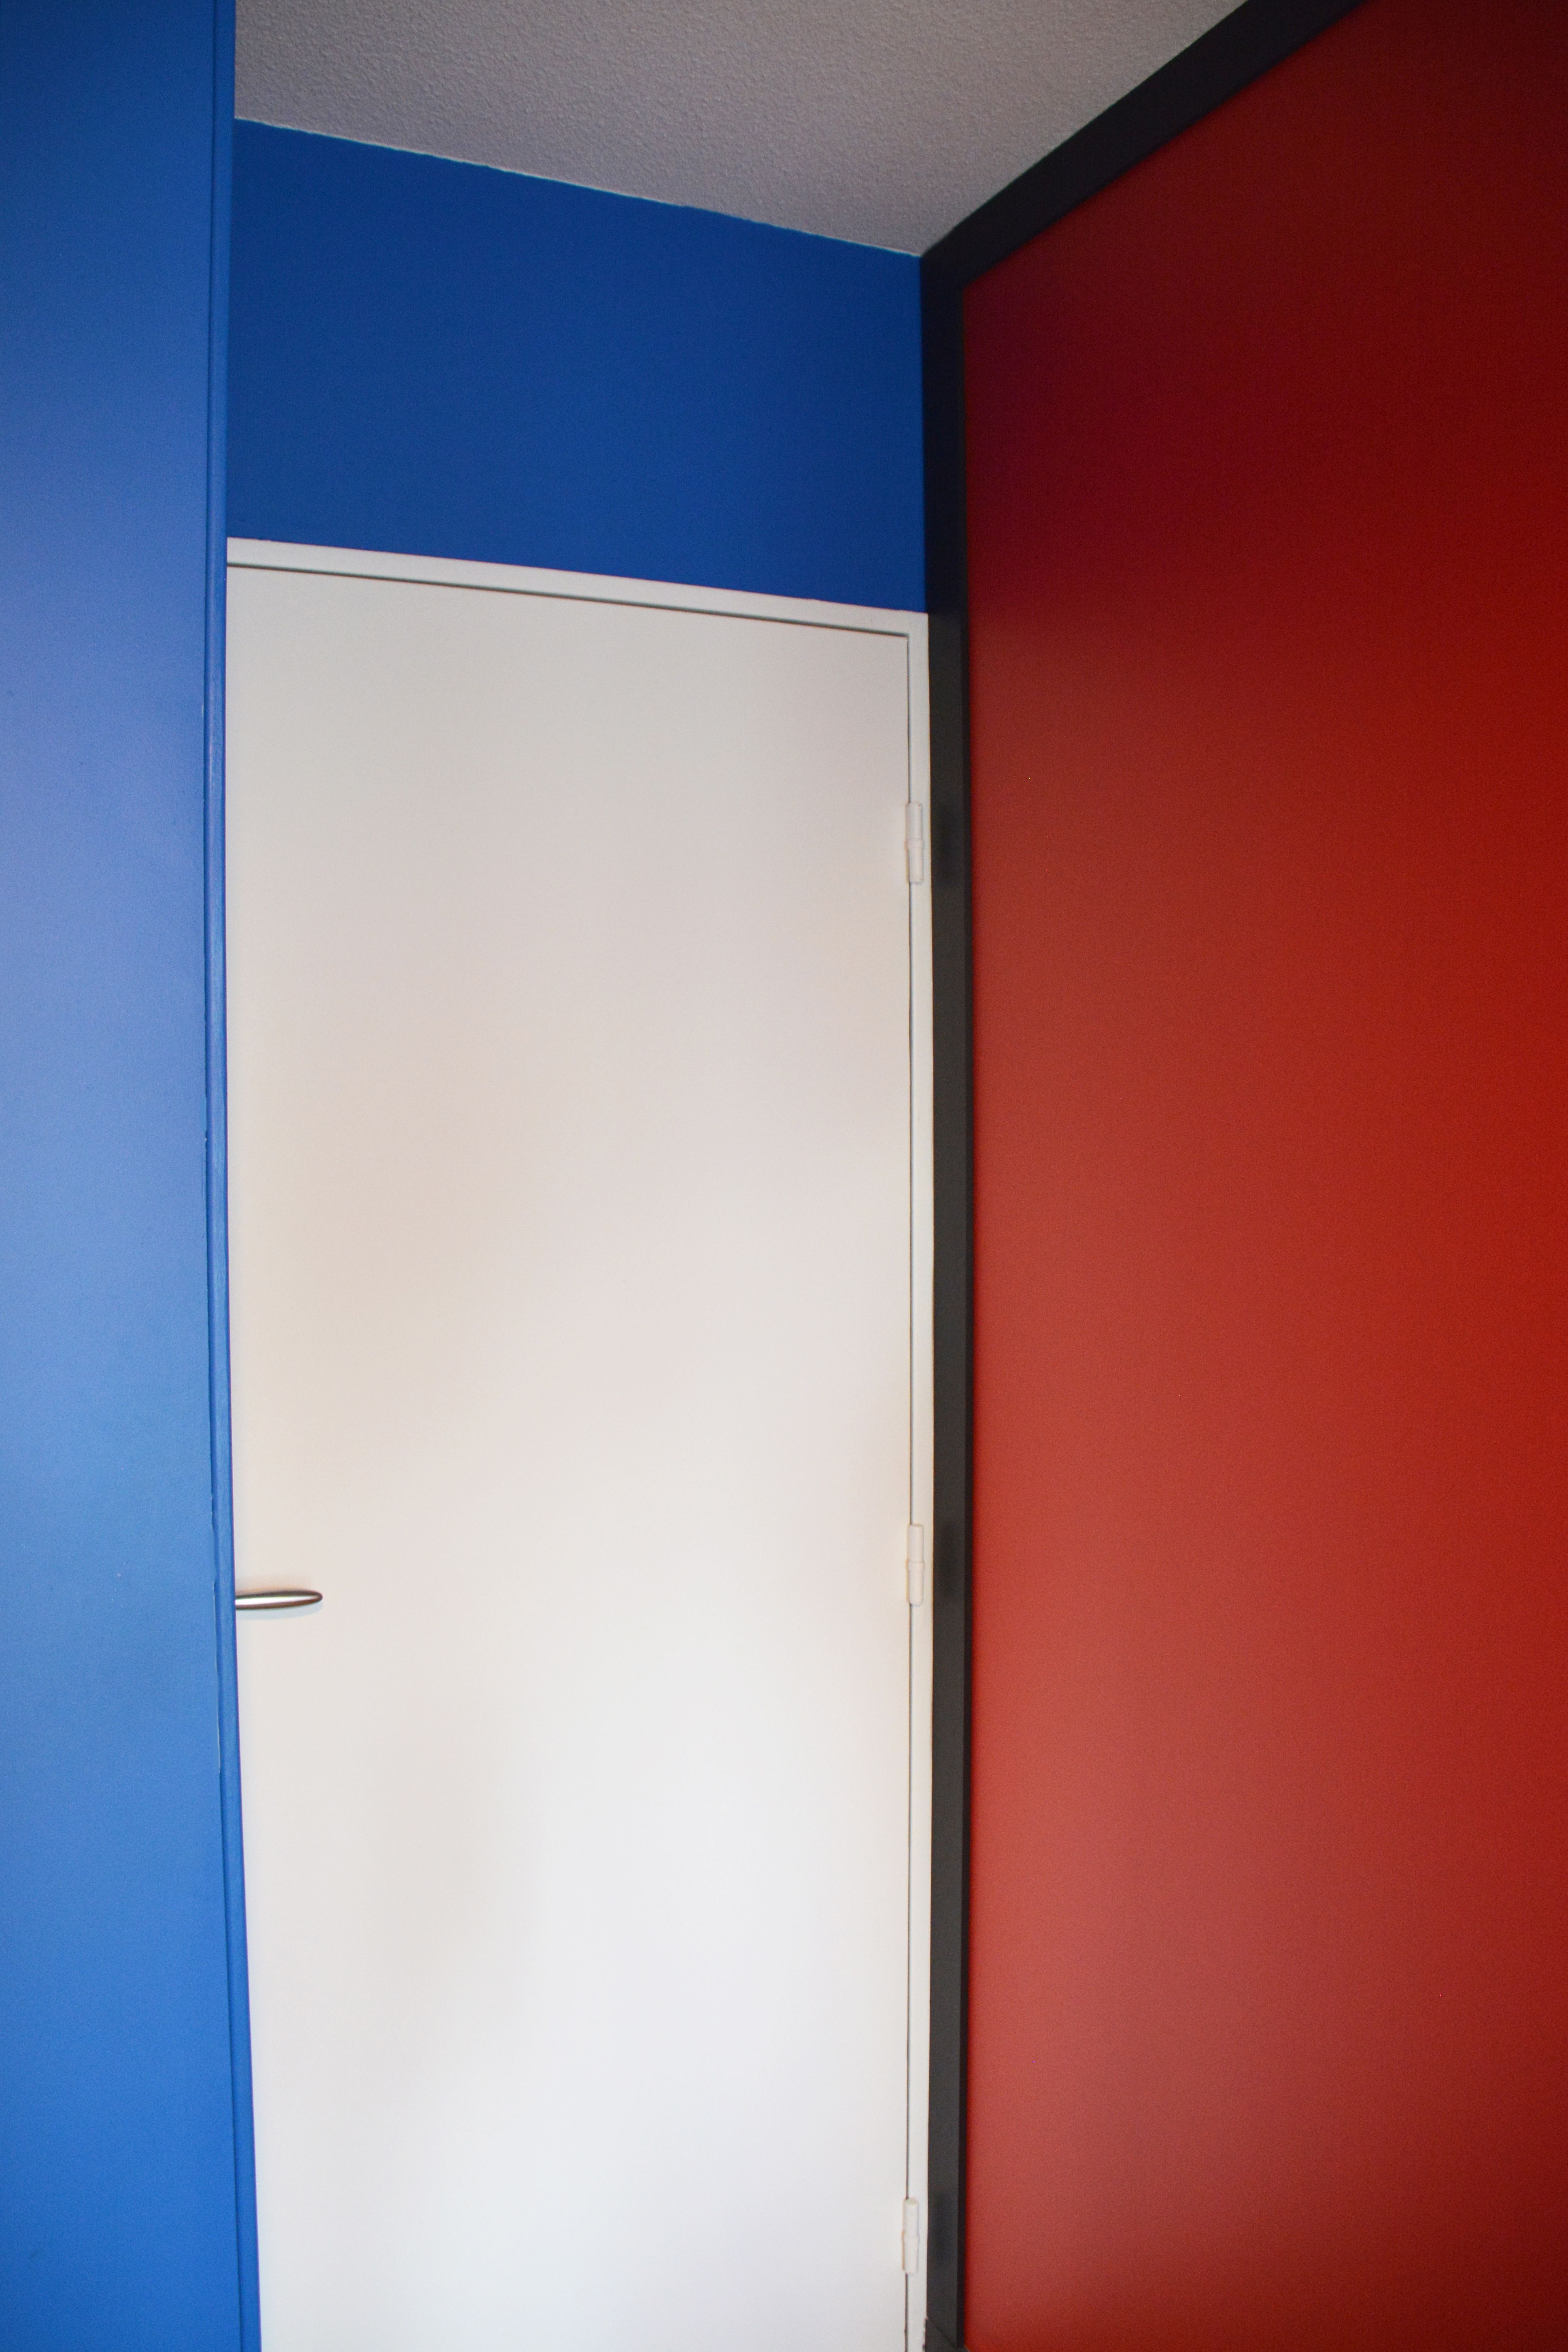 100 Incroyable Suggestions Chambre Enfant Bleu Blanc Rouge